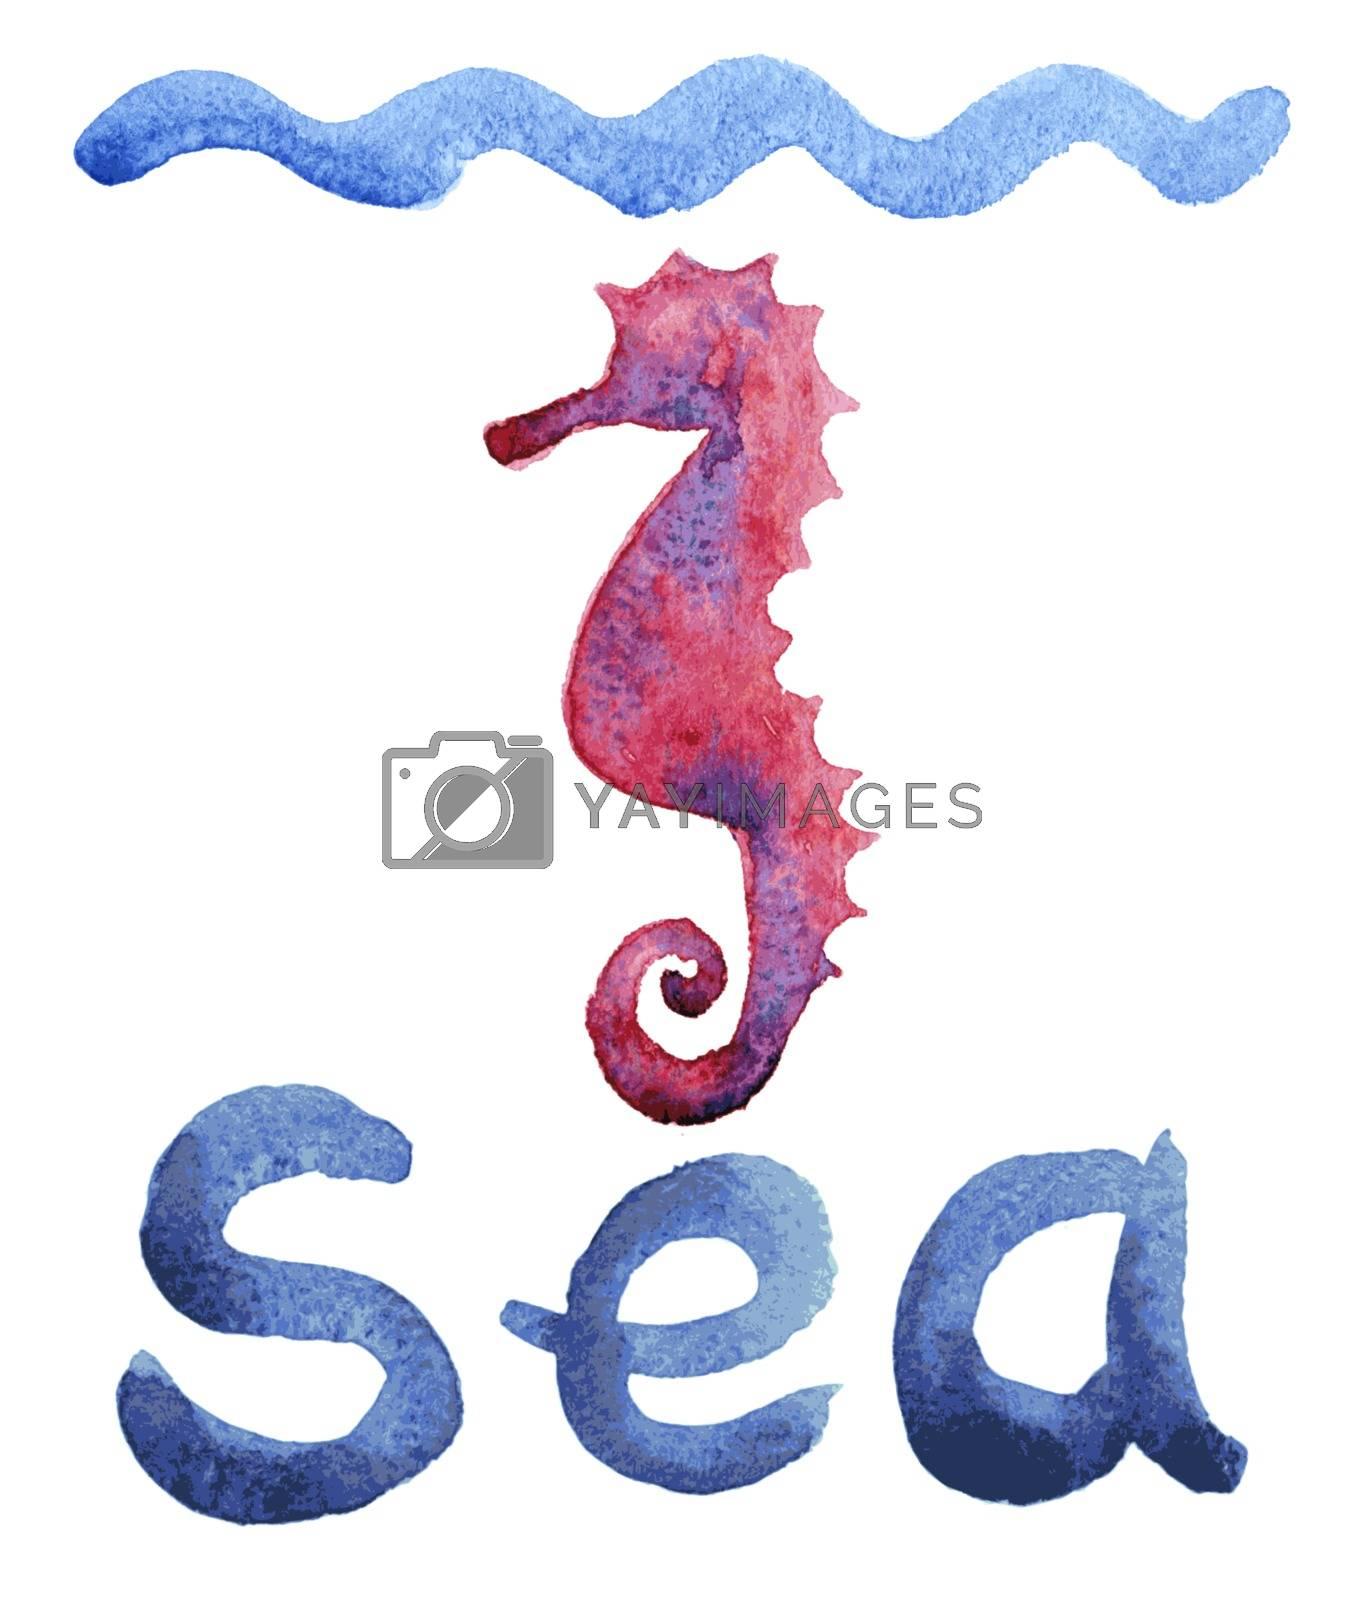 Royalty free image of Hand Painted Seahorse.  by OlgaBerlet